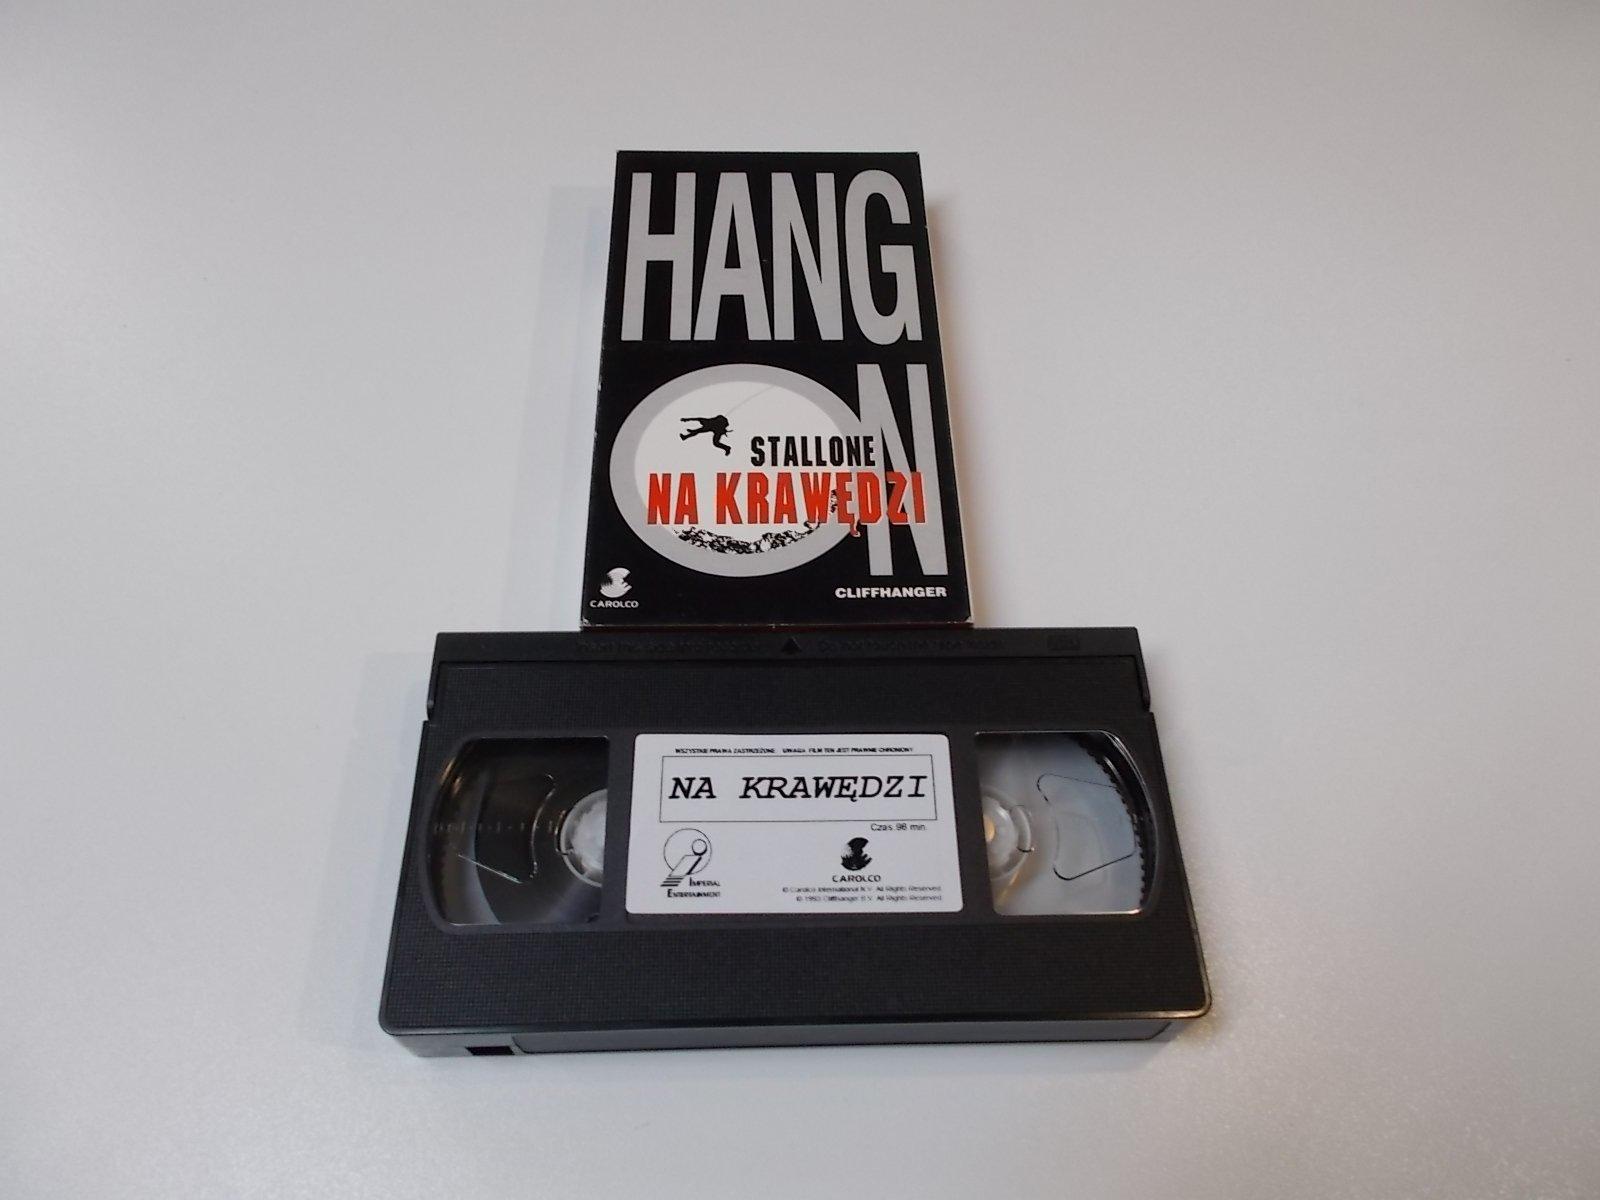 NA KRAWĘDZI - VHS Kaseta Video - Opole 1692